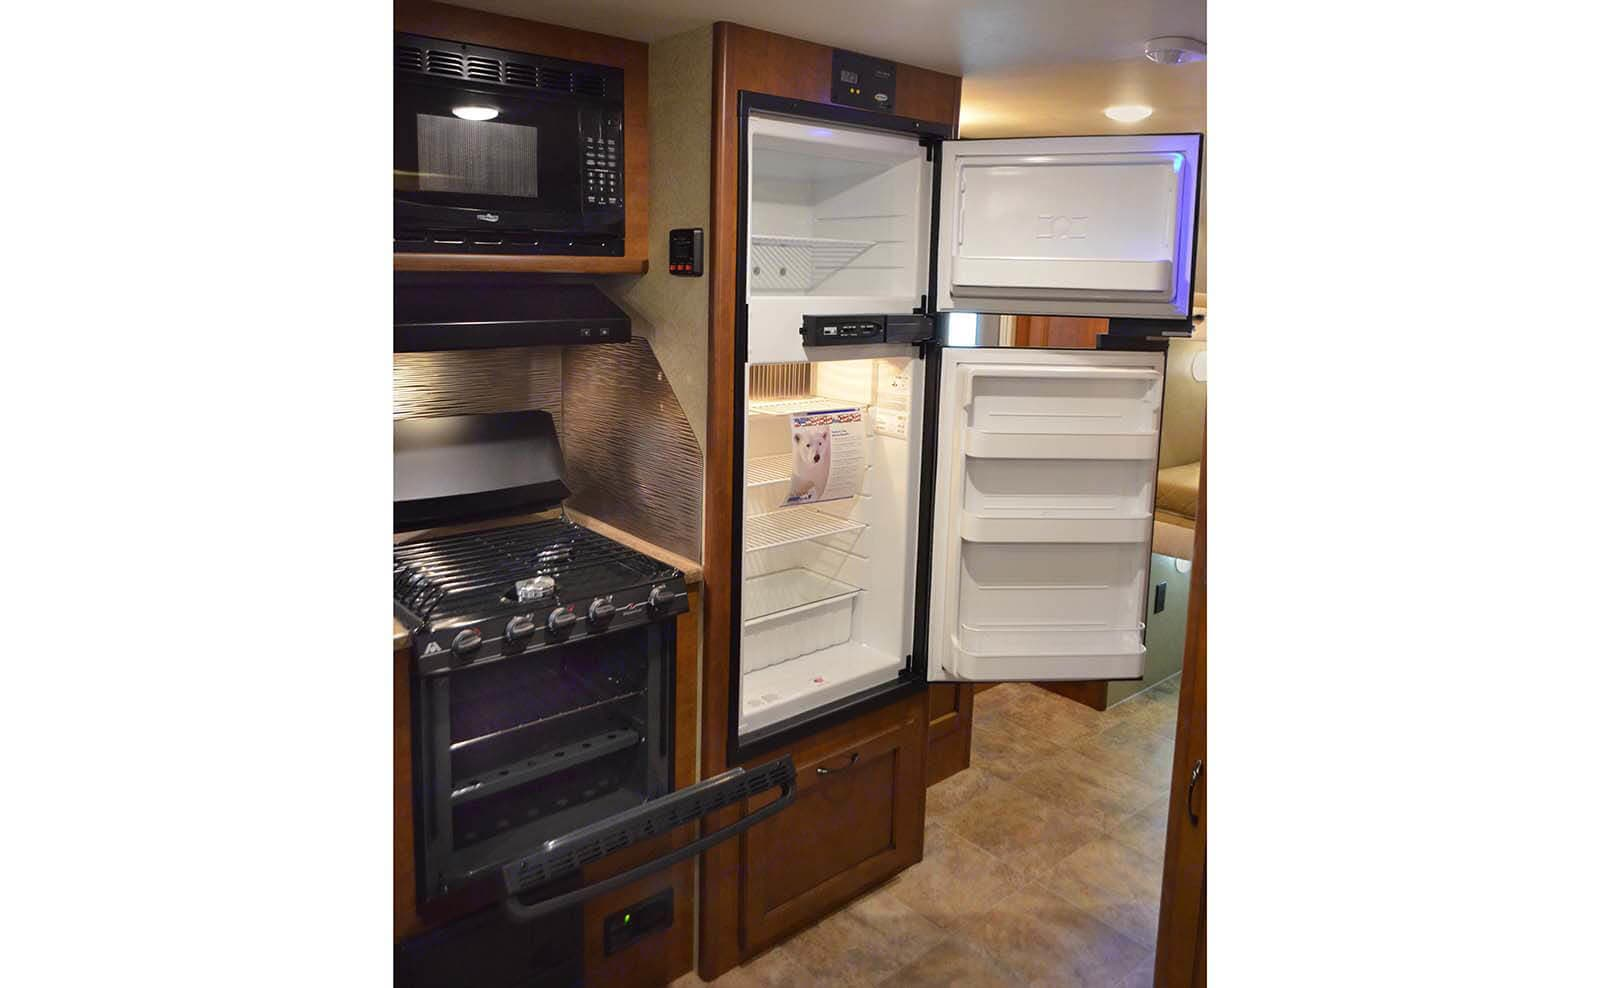 Refrigerator and Freezer. Lance 2185 2015